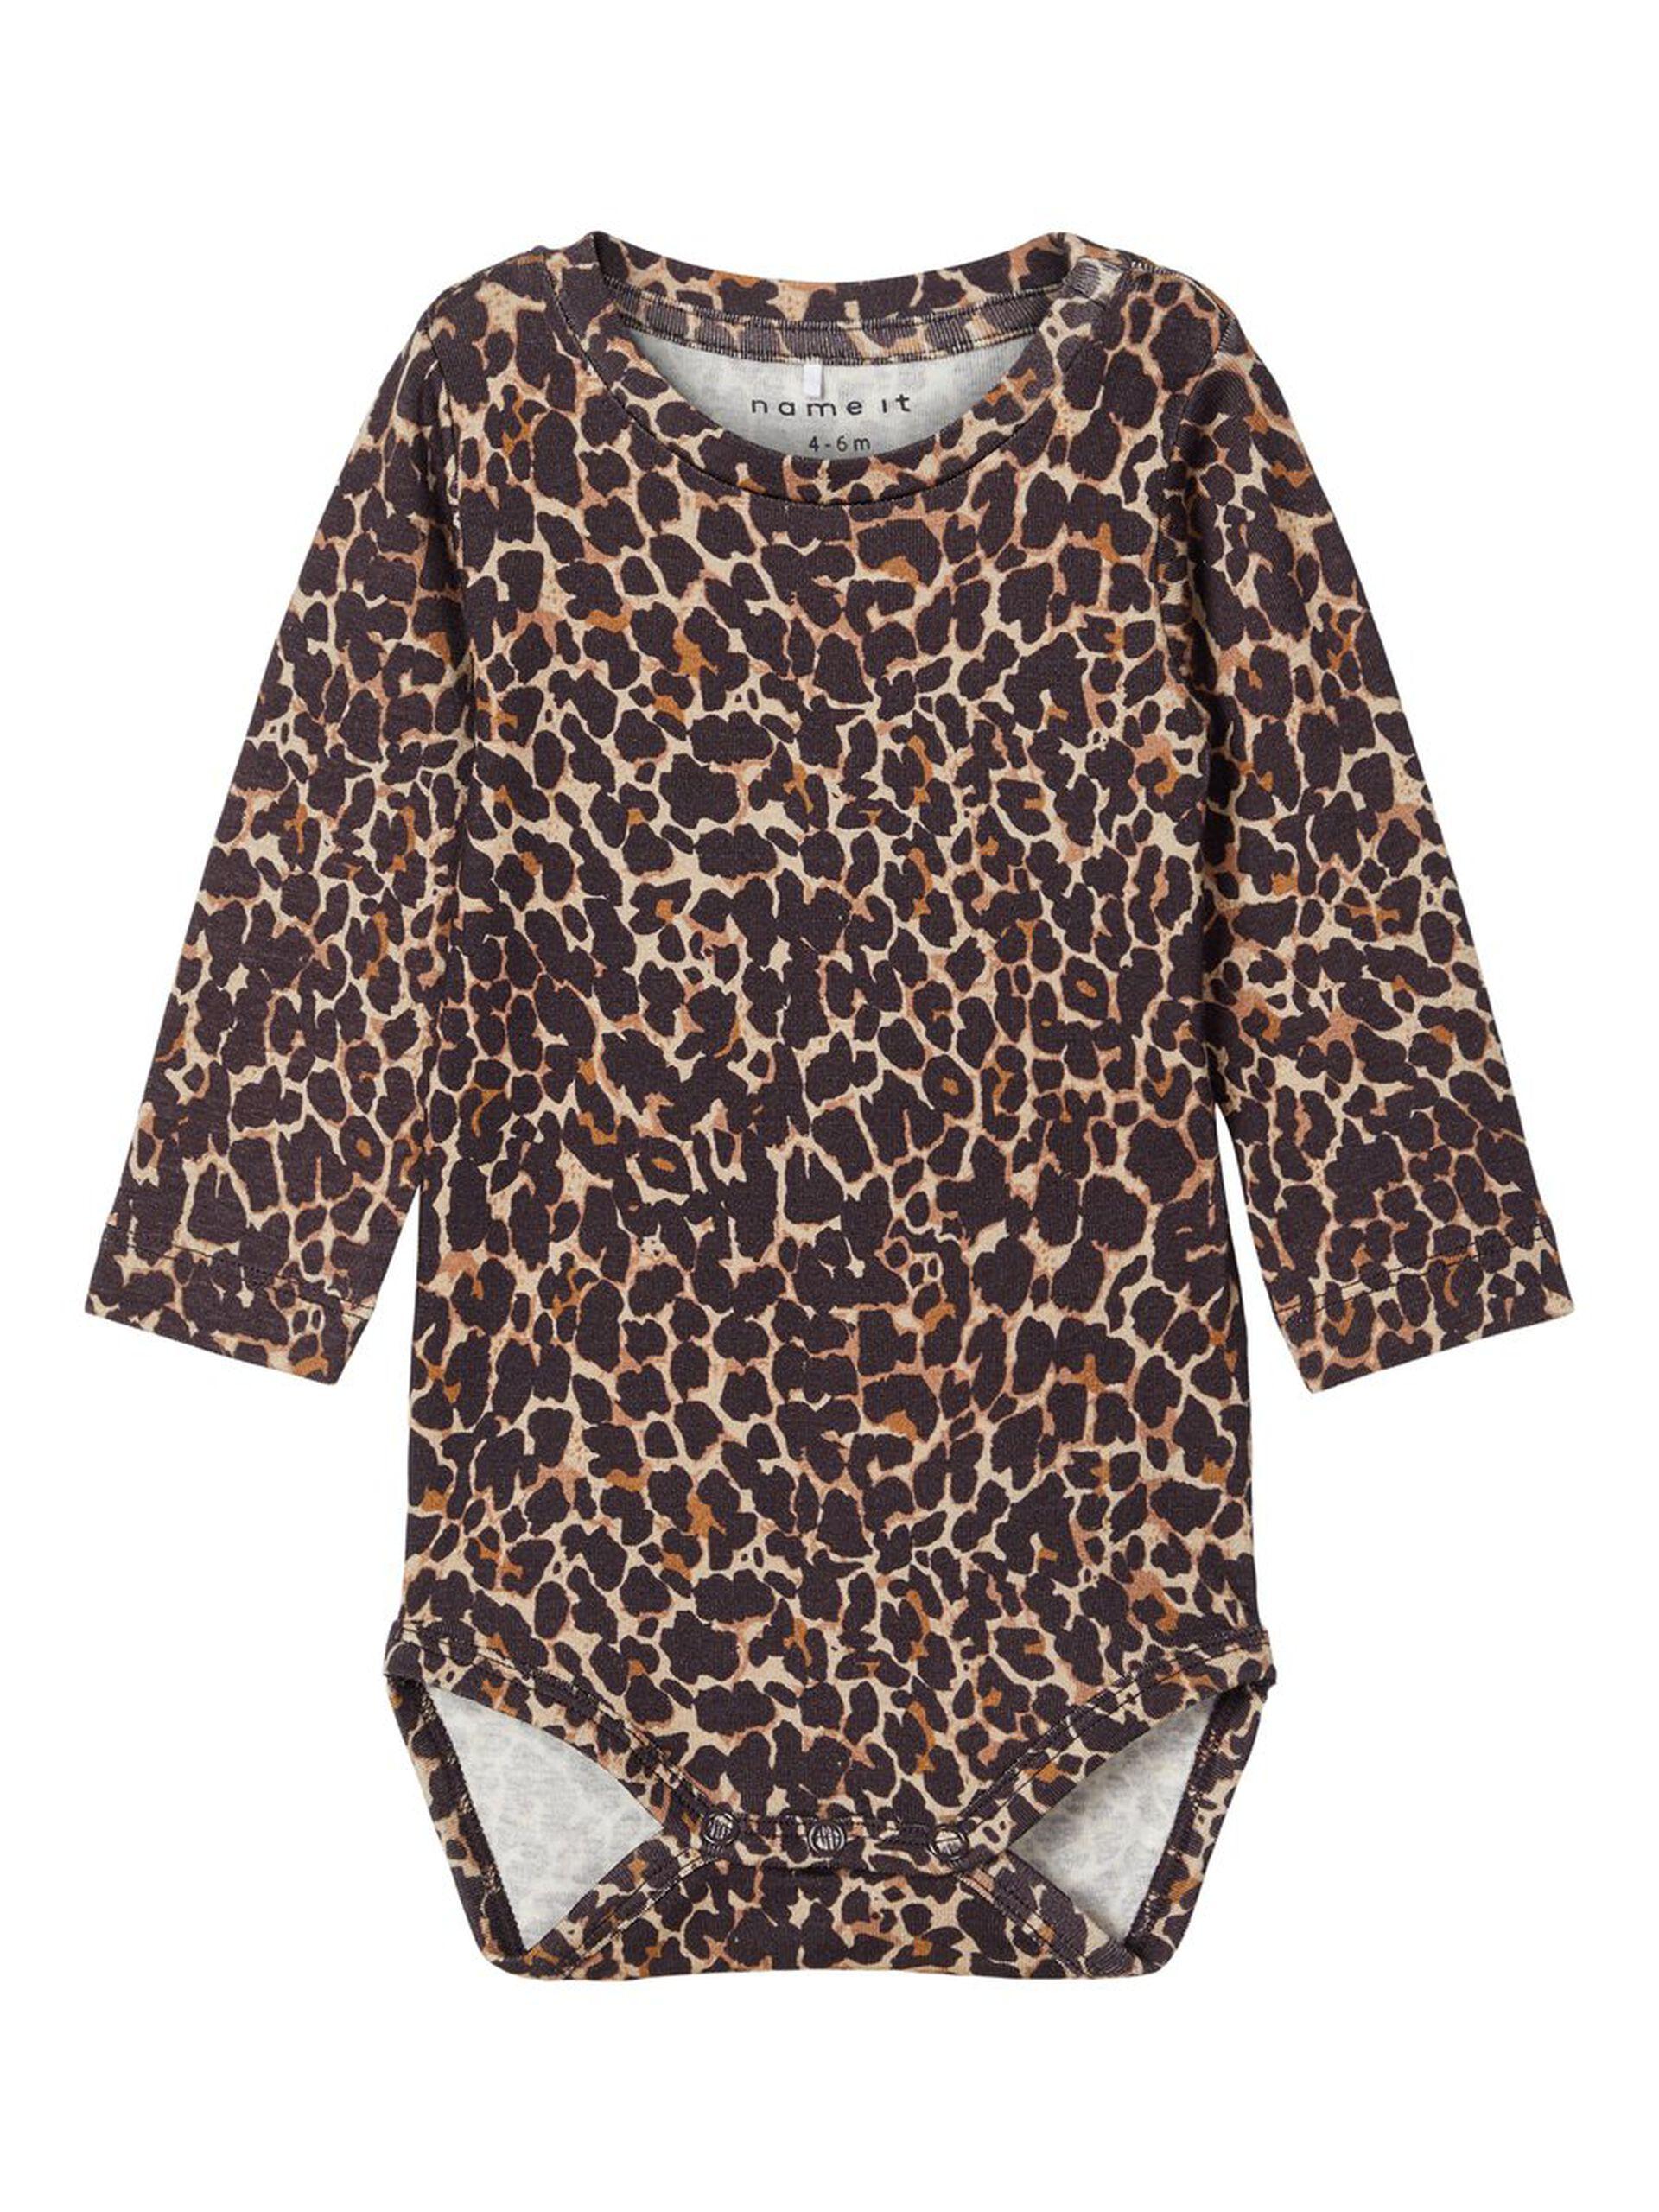 Body baby leopard